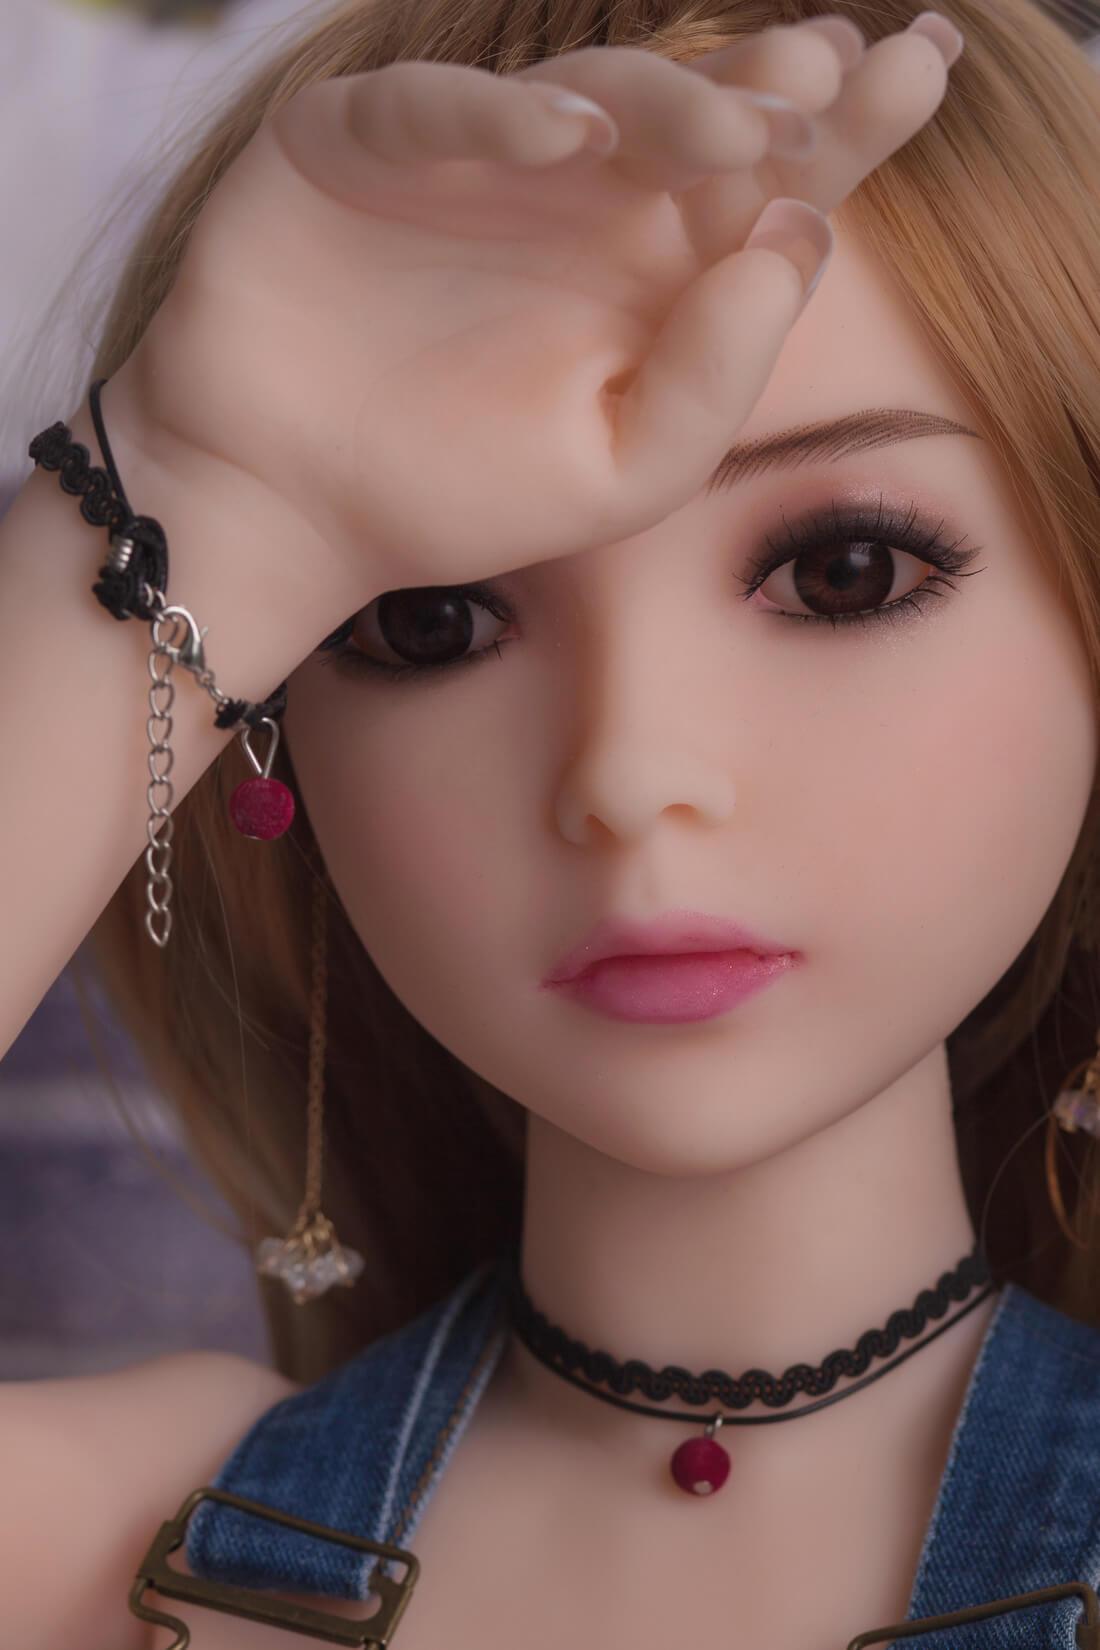 100CM Doll - Canace